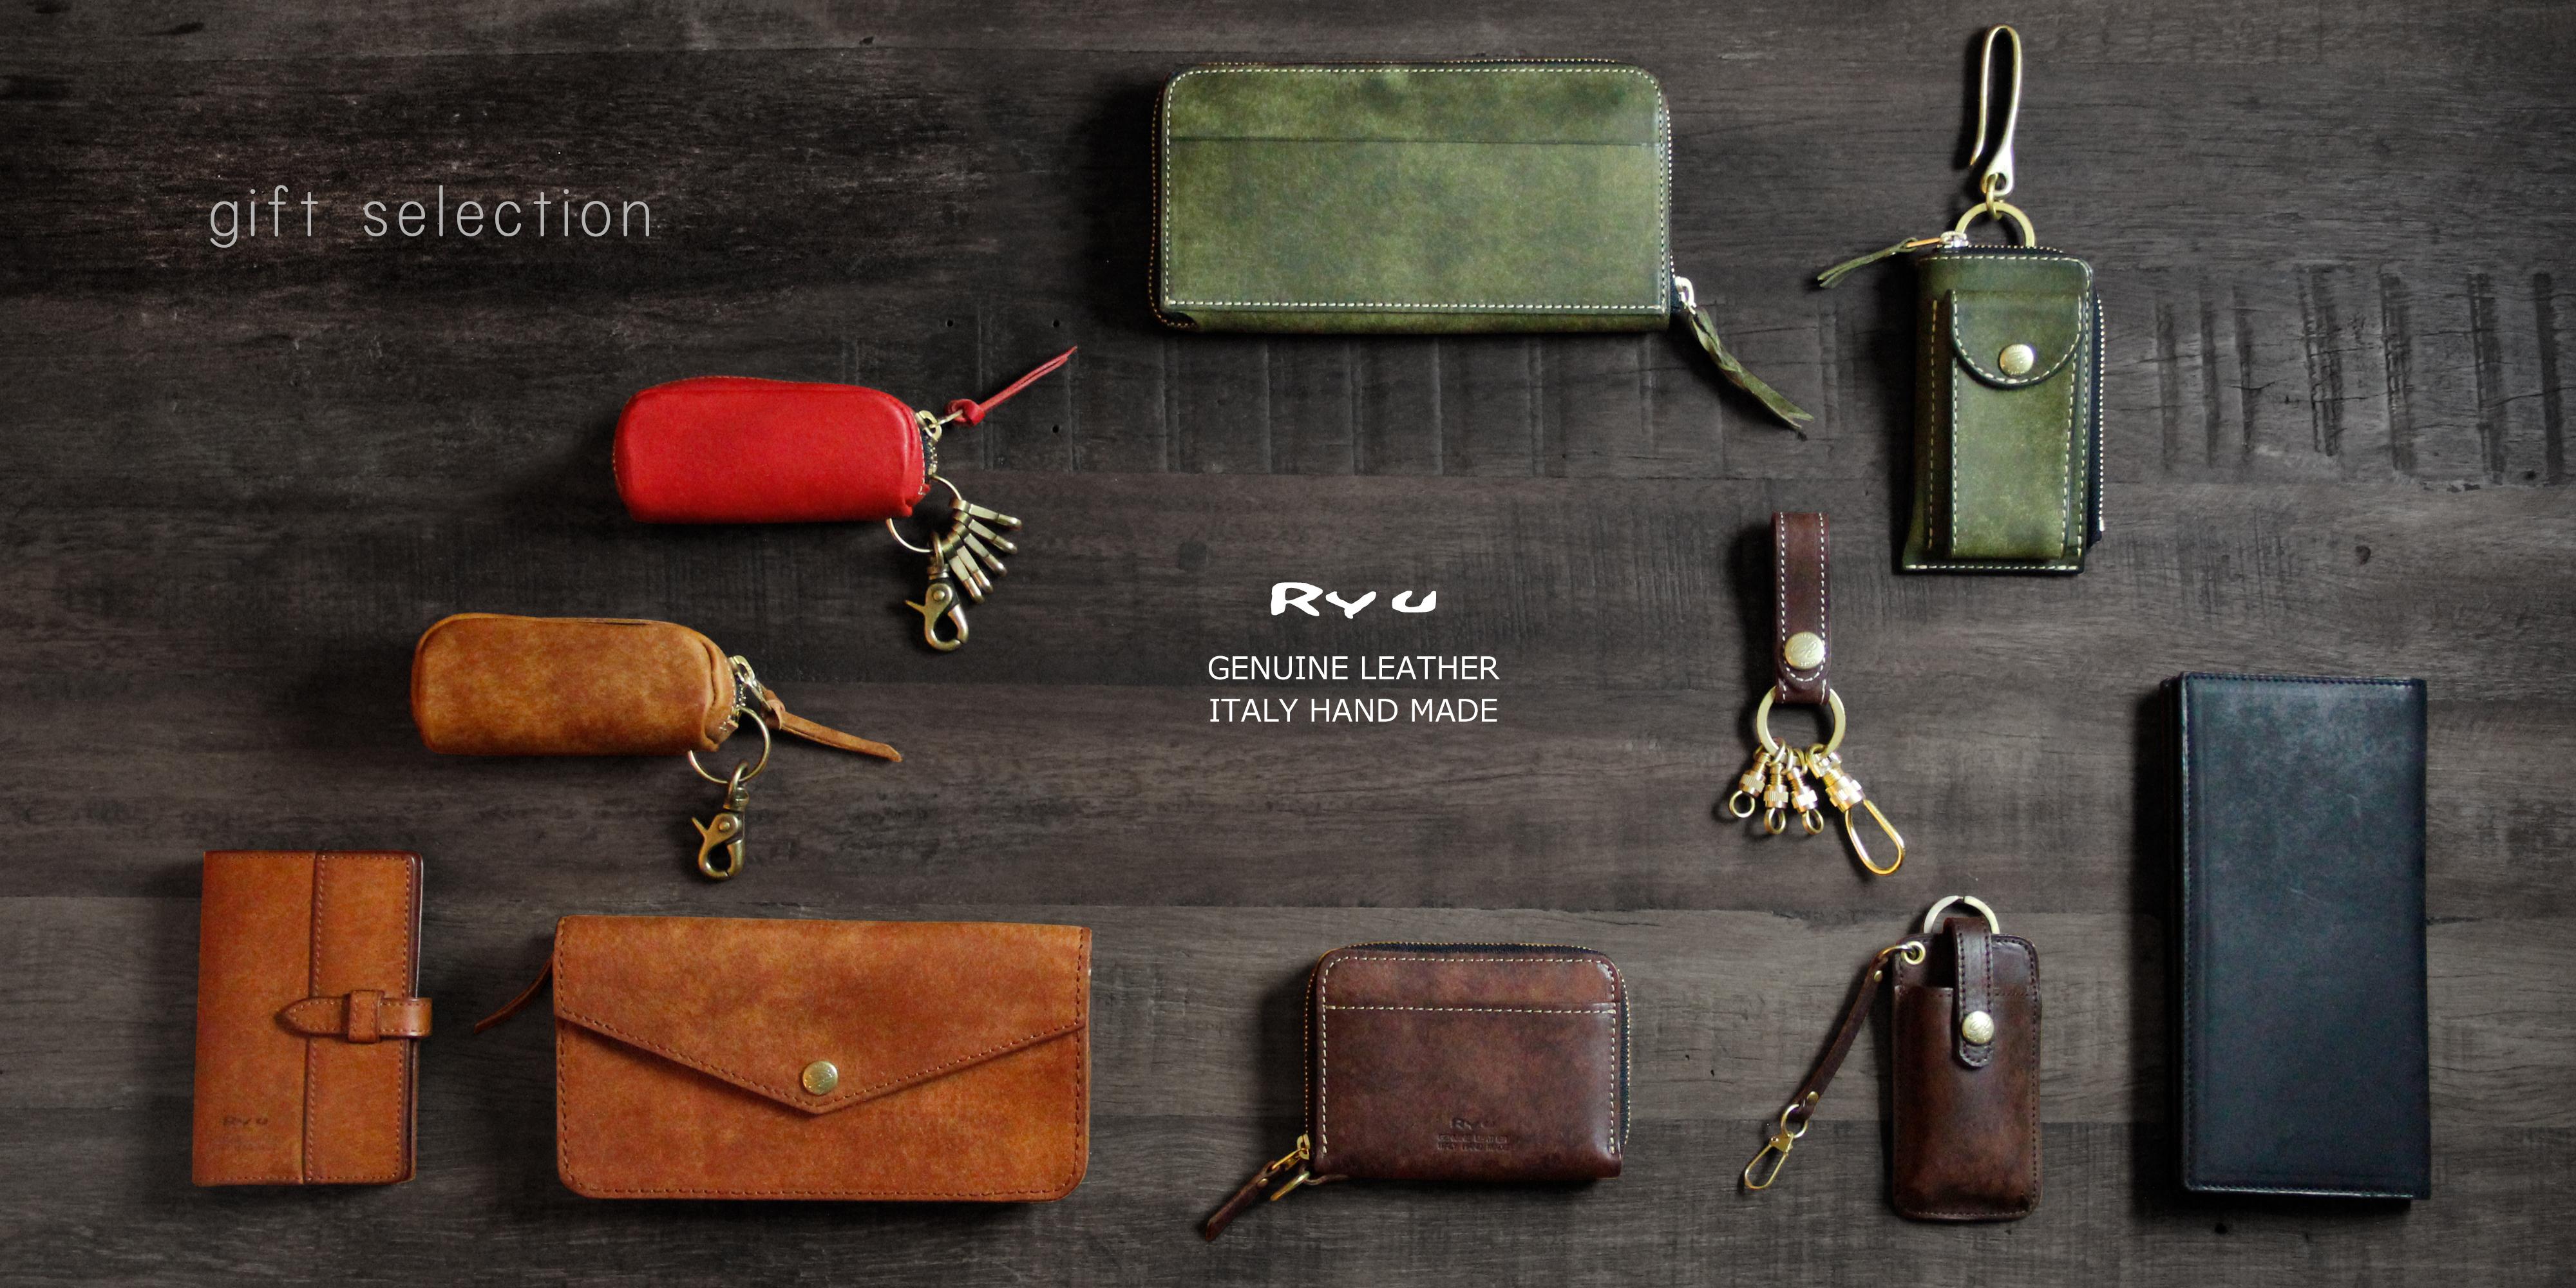 Pick Up / Ryu X'mas gift selection